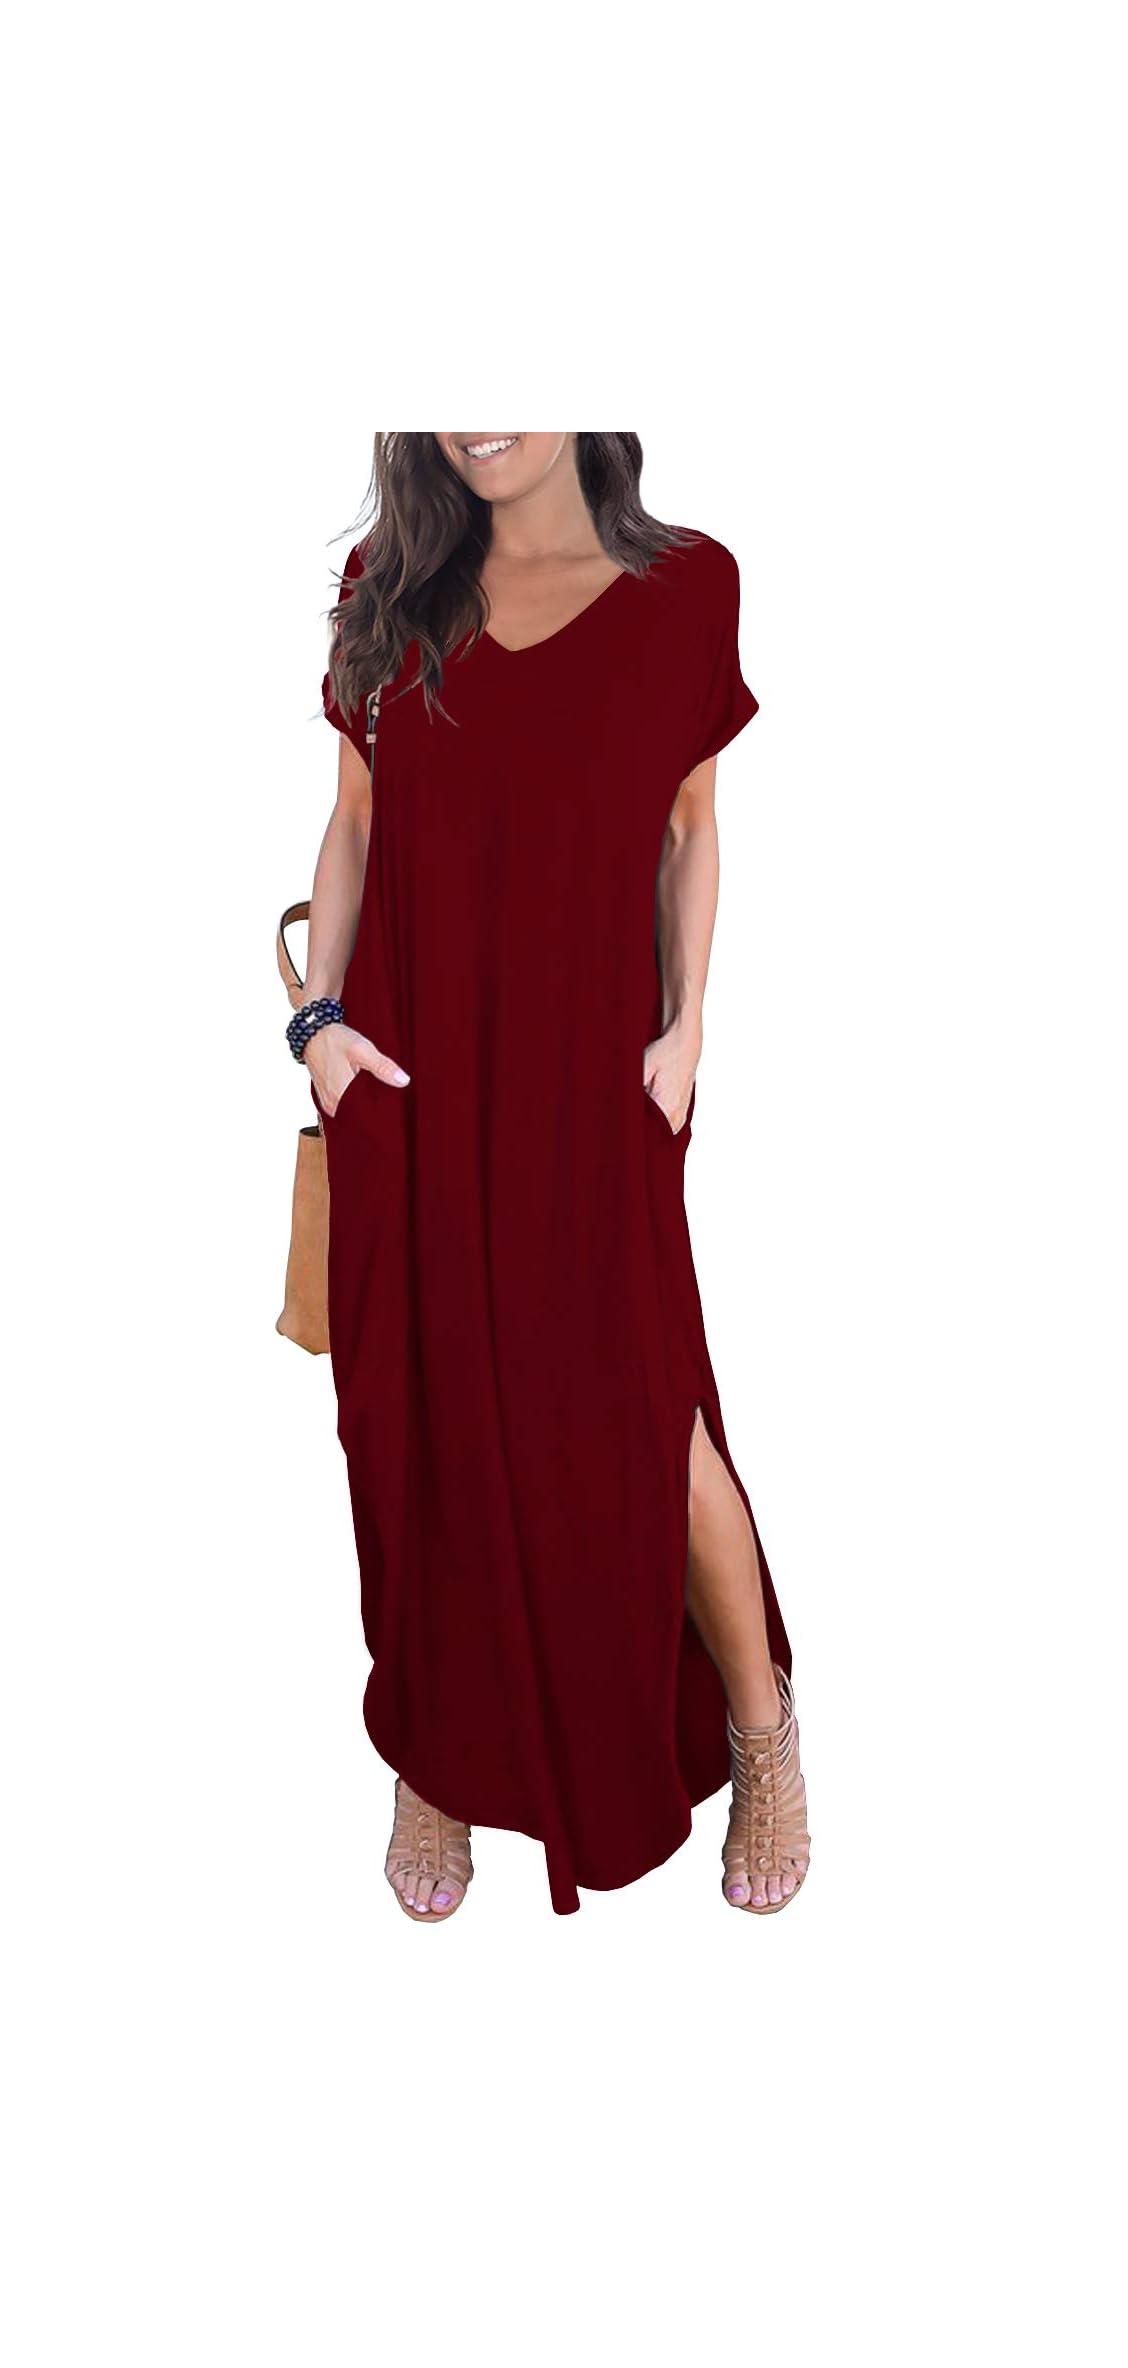 Women's Casual Loose Pocket Long Dress Short Sleeve